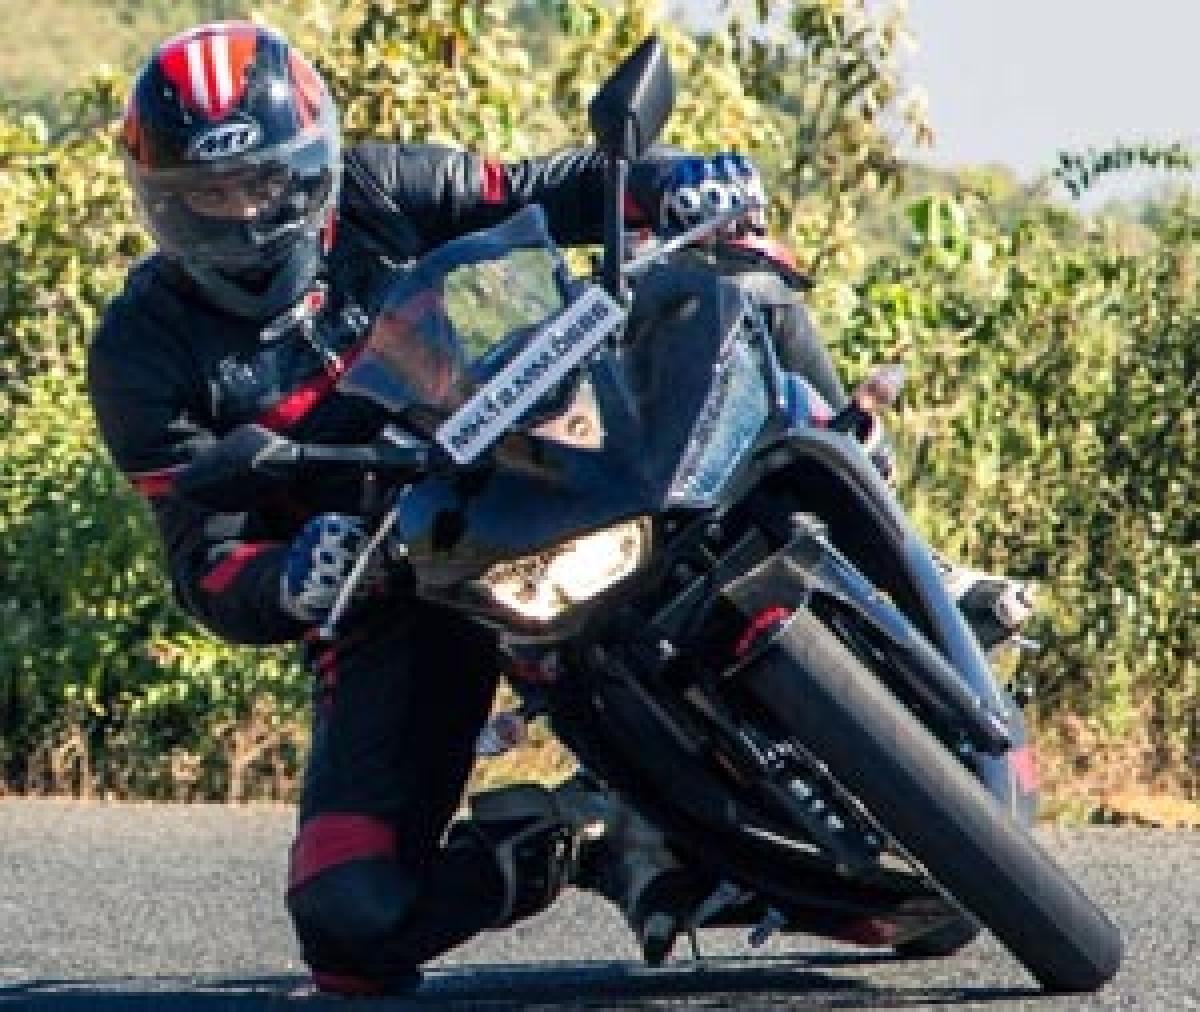 902 Yamaha R3 recalled in India